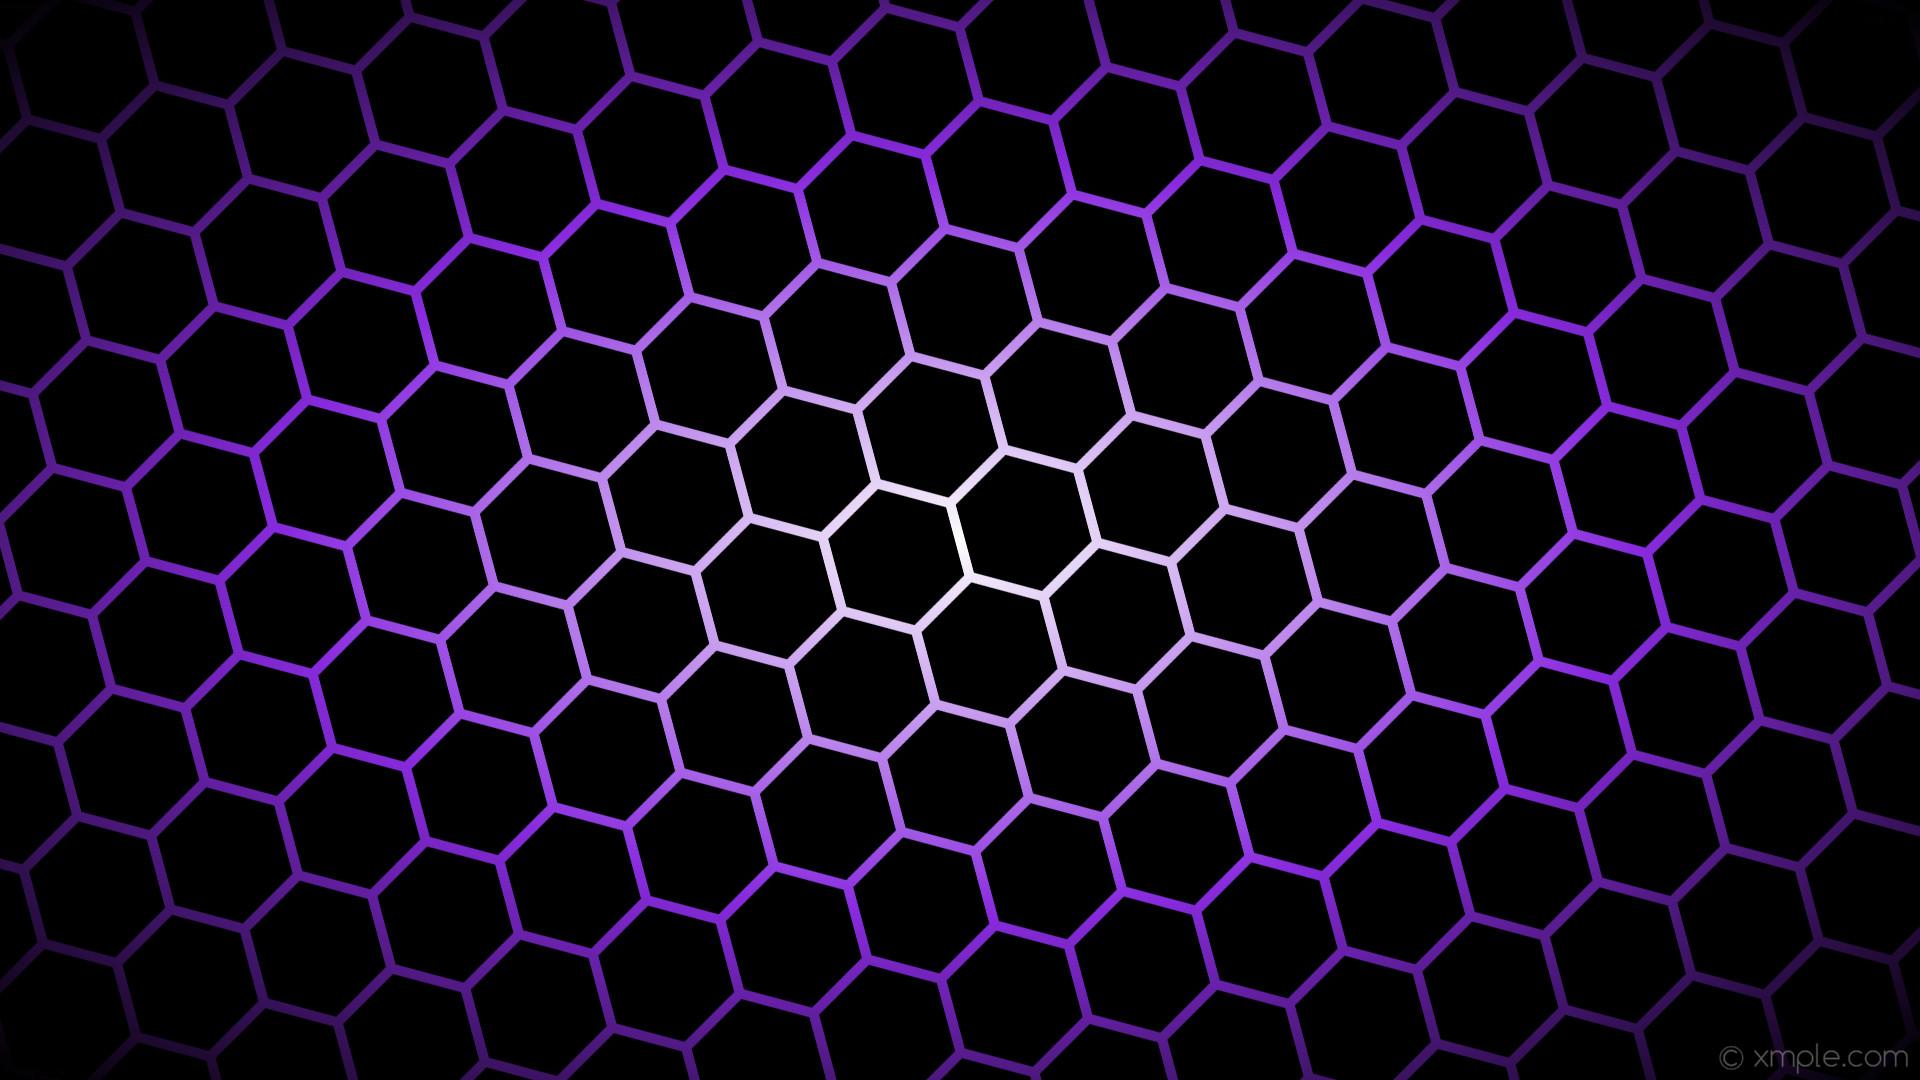 Cool Purple Iphone Wallpapers: Purple Desktop Wallpapers (77+ Images